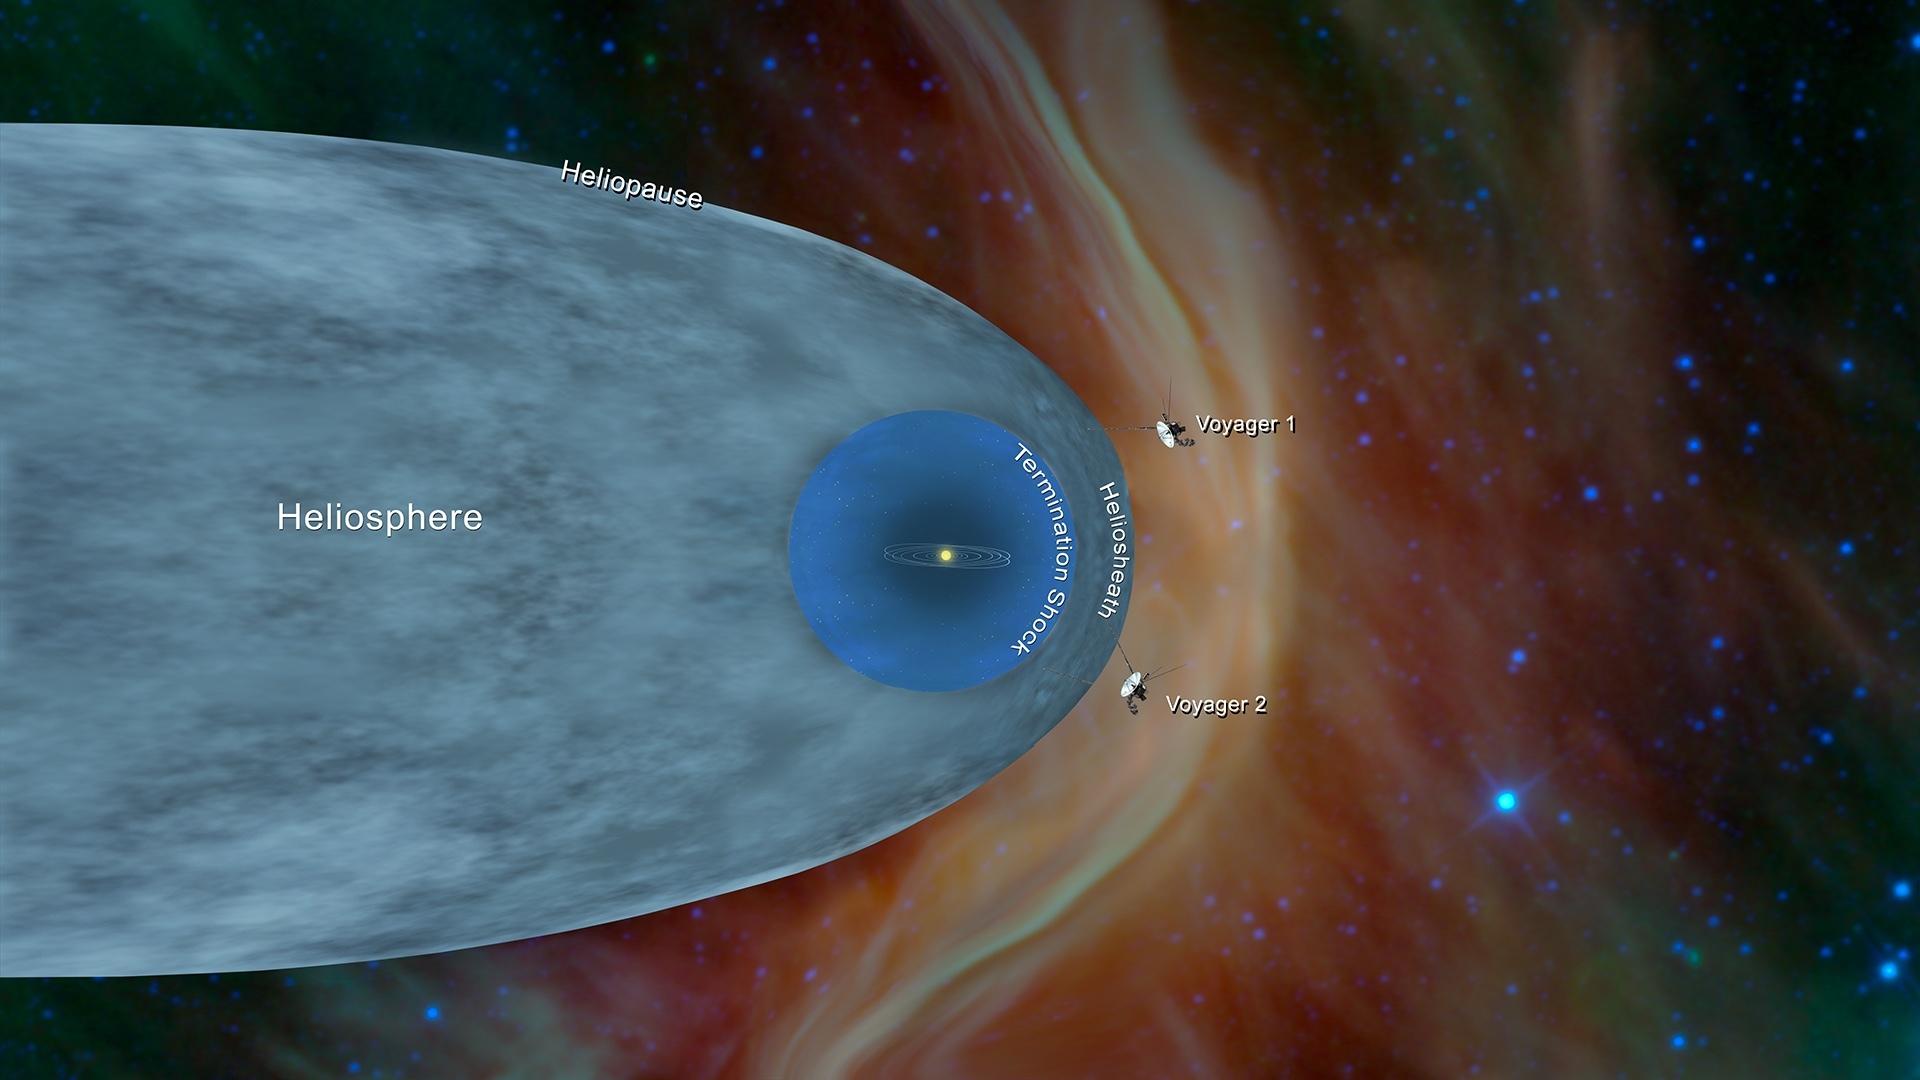 NASA's voyager 2 probe has reached interstellar space